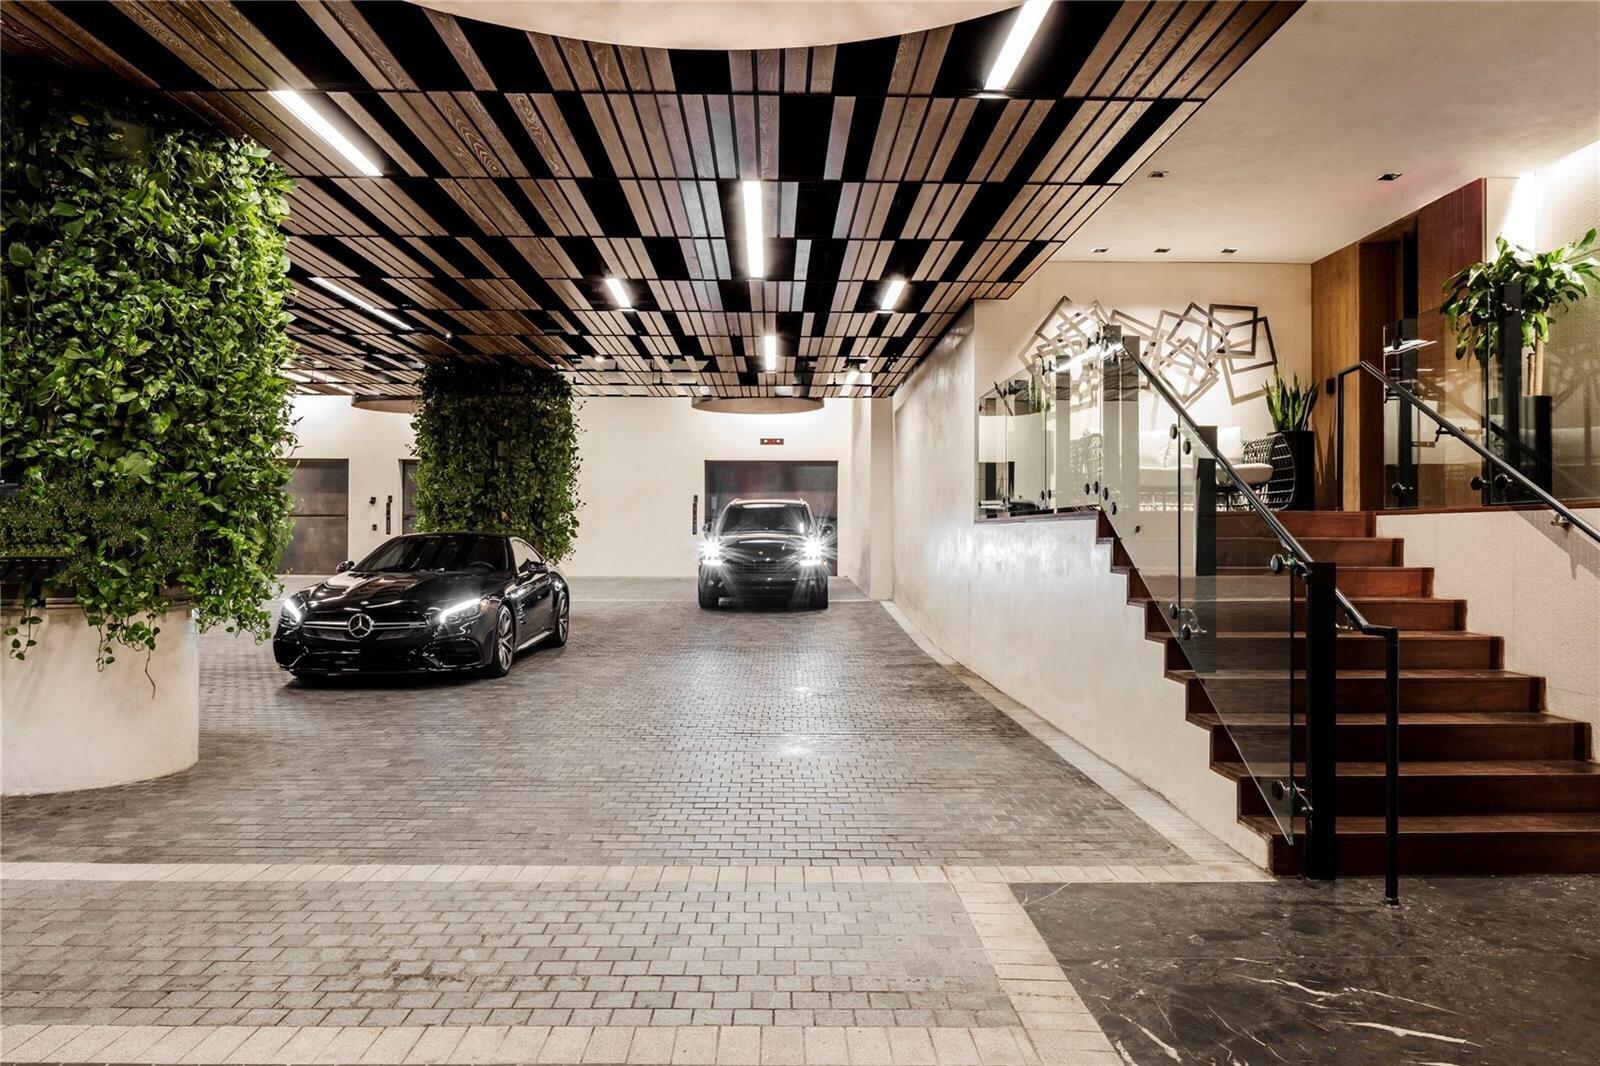 porte-cochere-echo-brickell-entrance-valet_lipstickandchicspaces.com.JPG